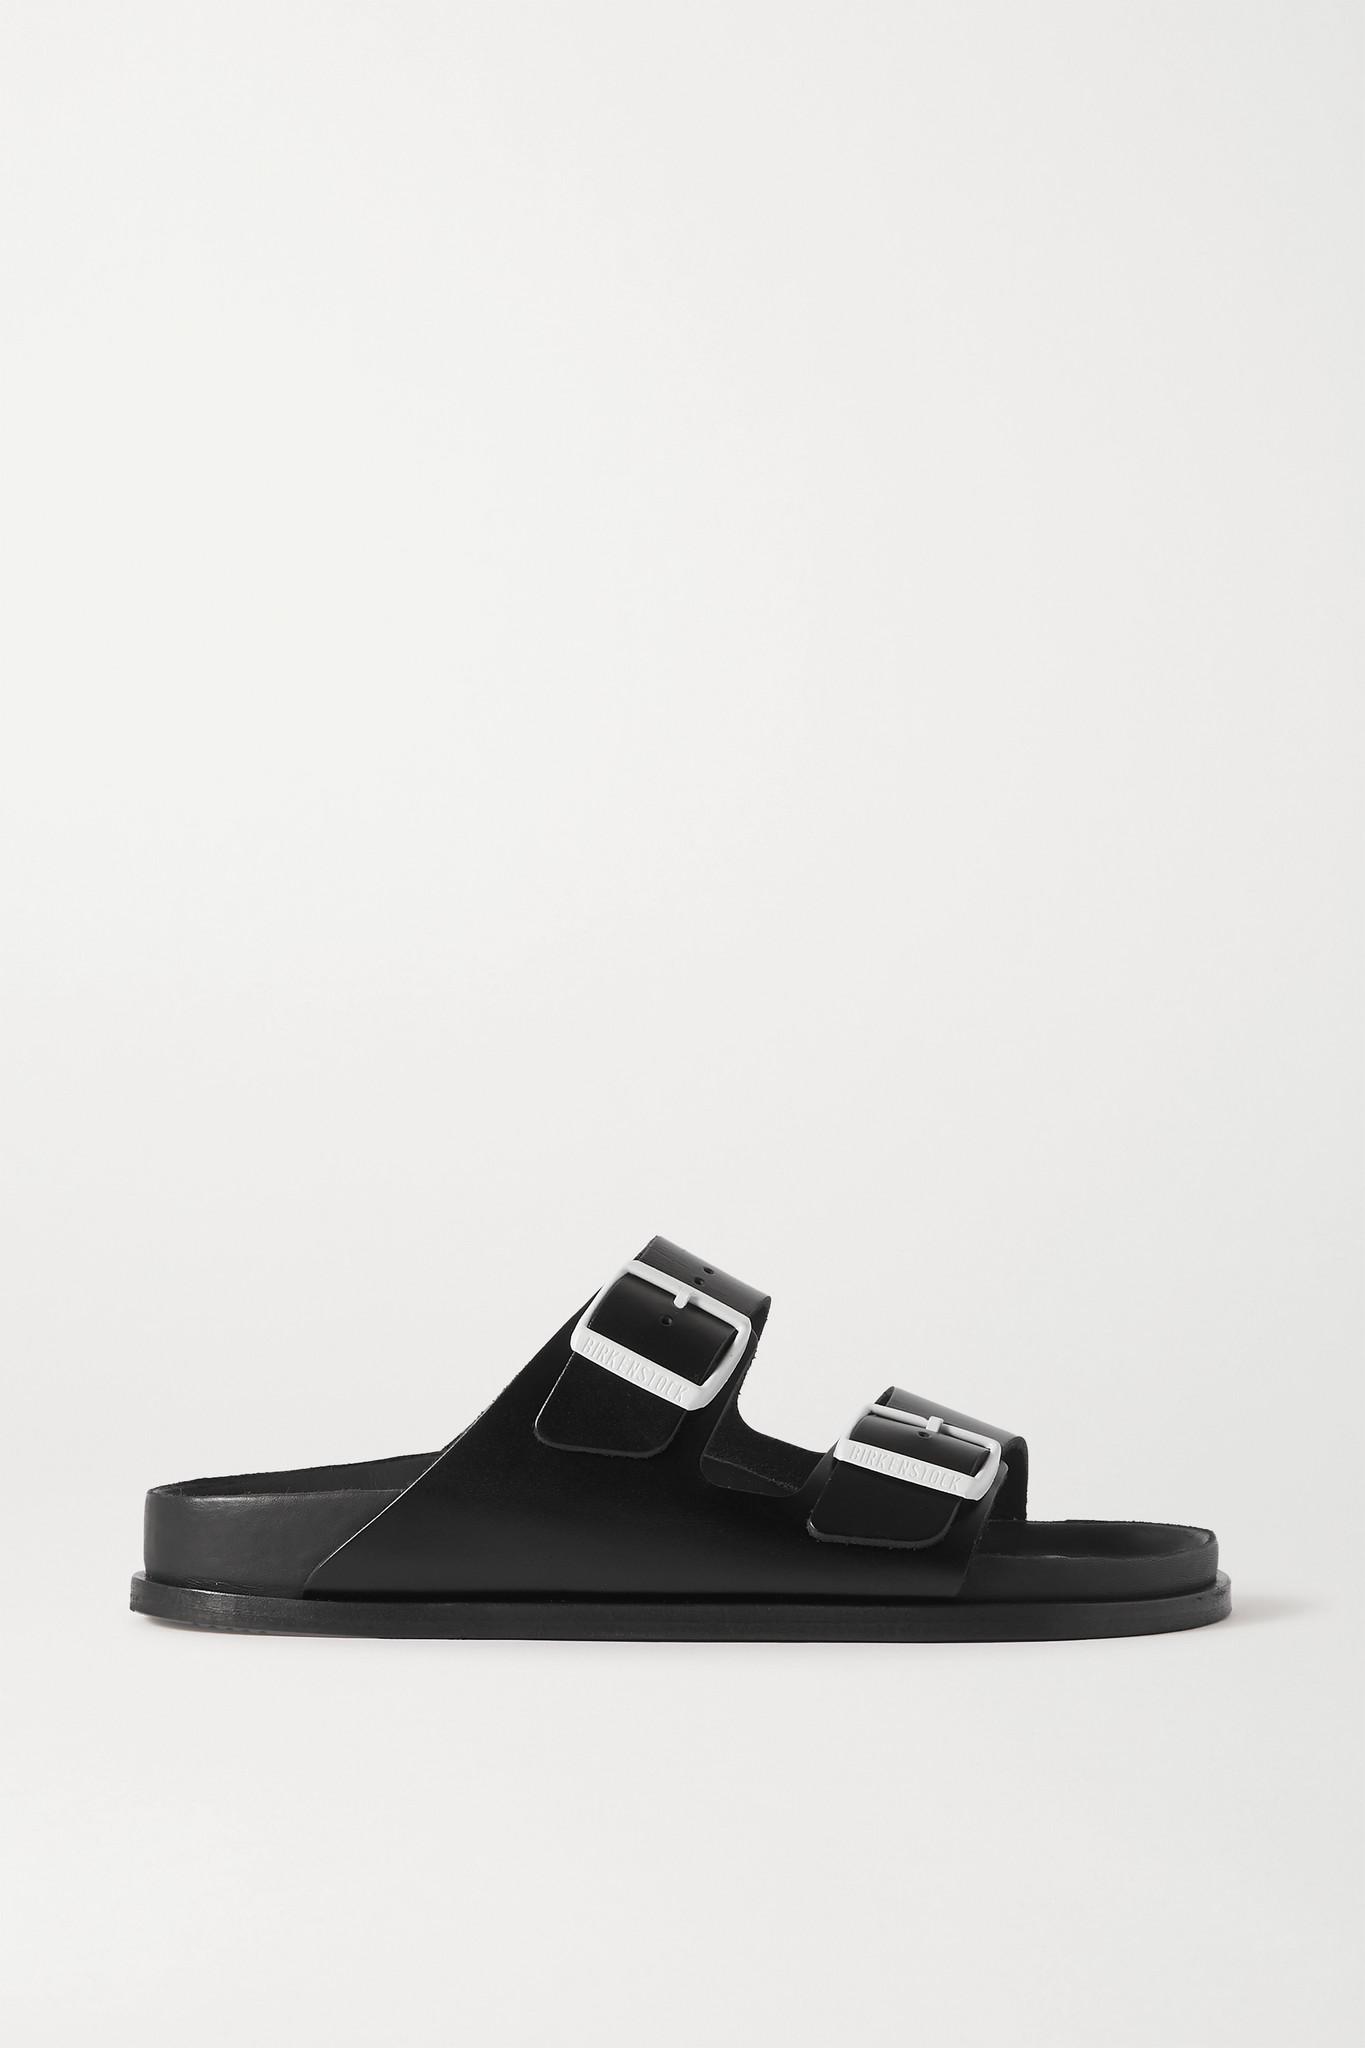 BIRKENSTOCK - + Net A Porter Arizona Leather Sandals - Black - IT36